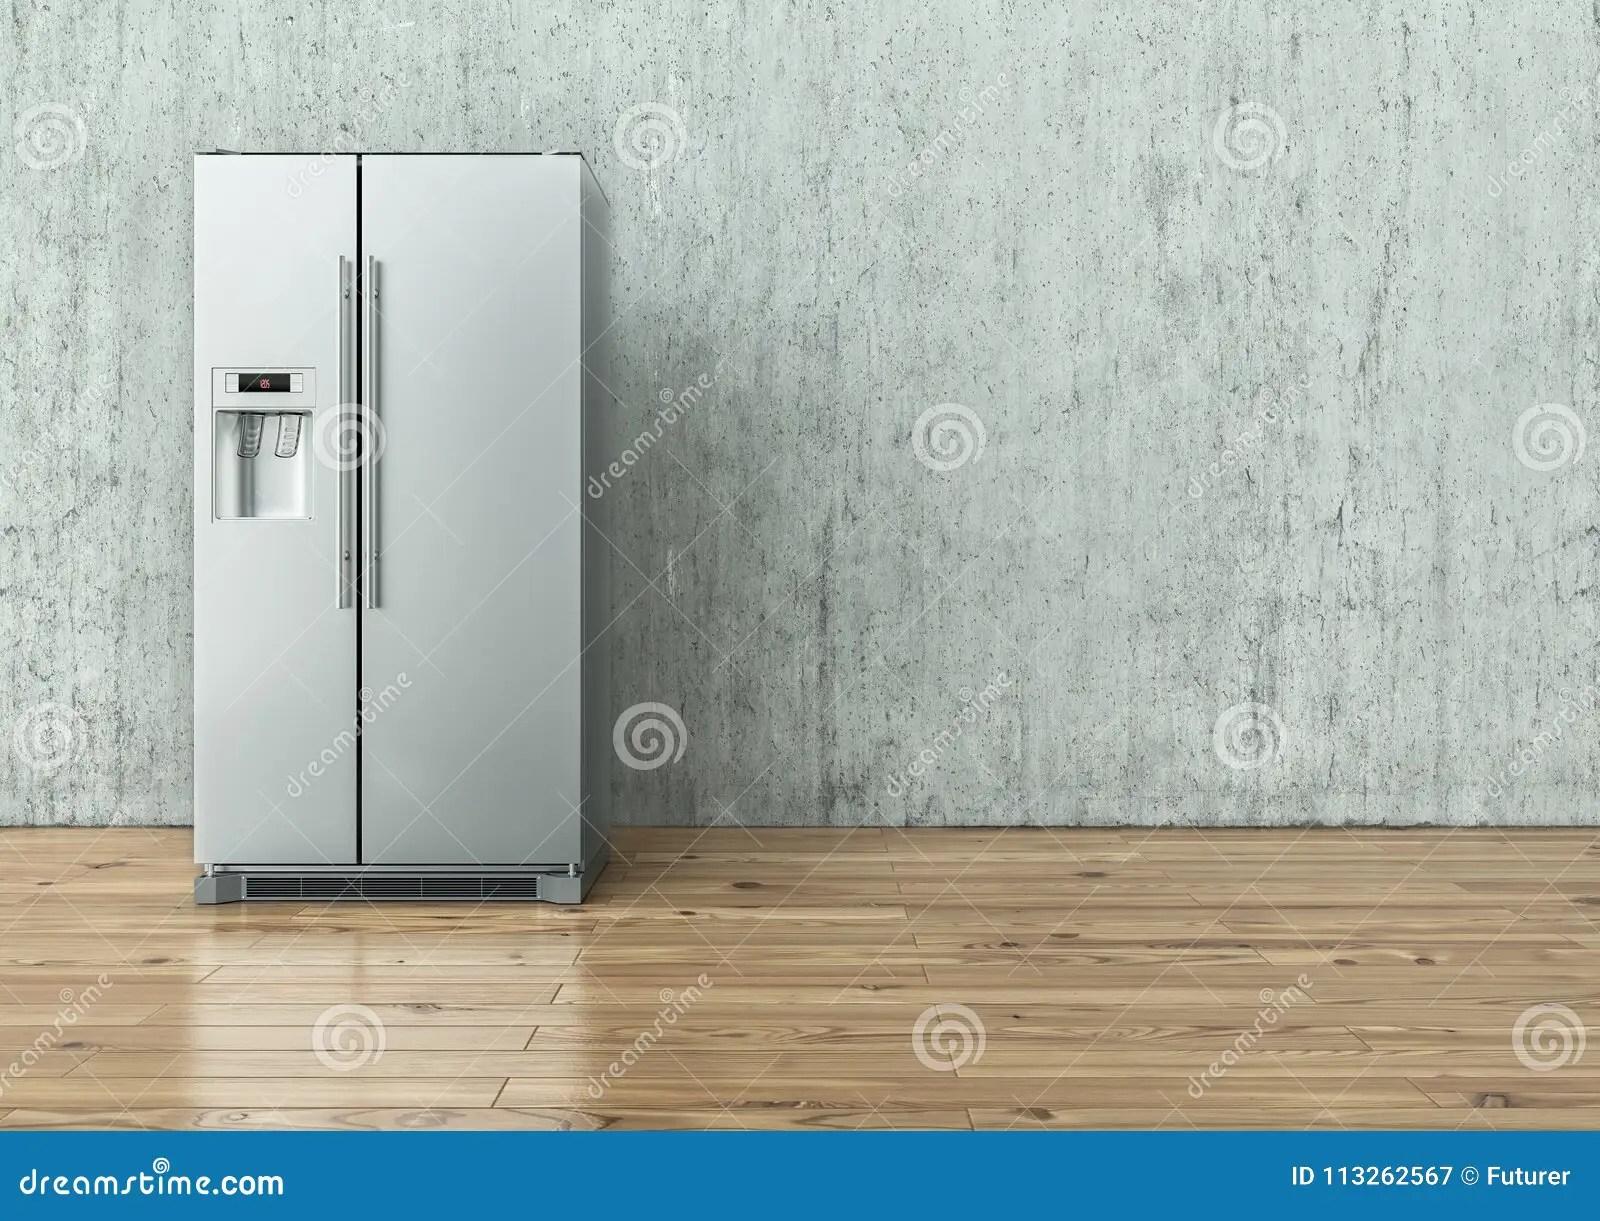 Retro Kühlschrank Notebooksbilliger : Kühlschrank edelstahl türgriff liebherr 9096532 edelstahl für